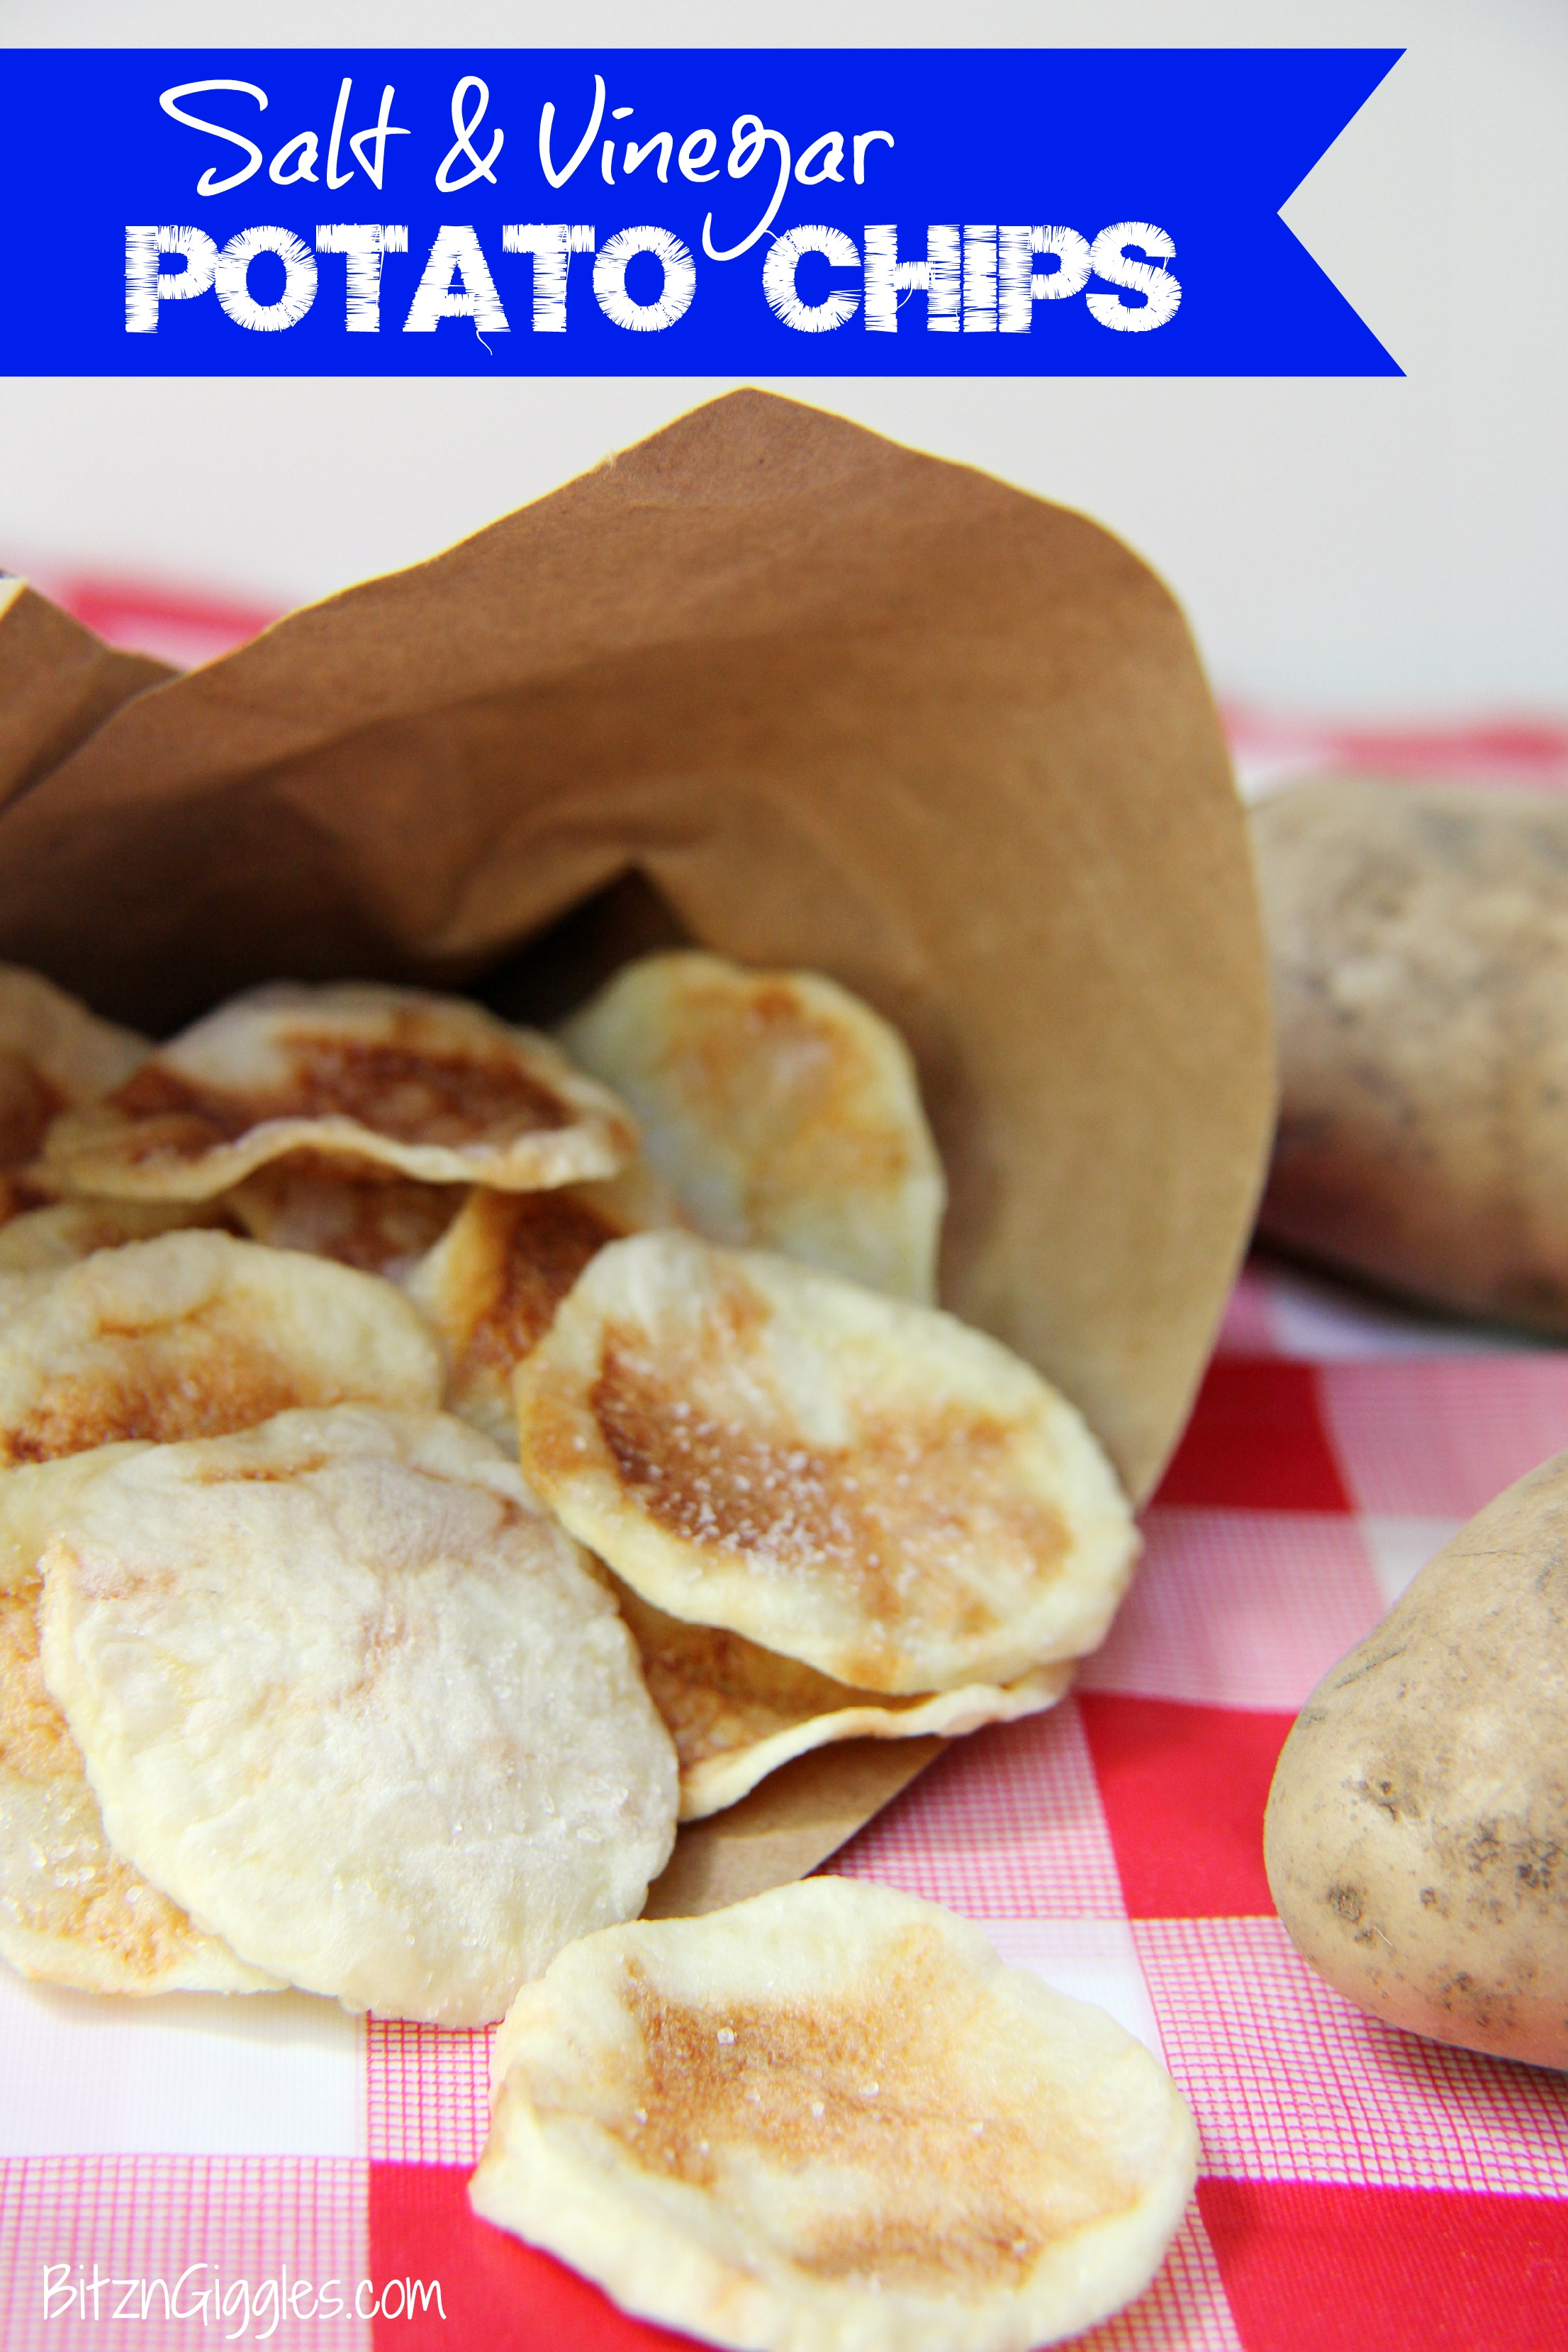 Salt and Vinegar Potato Chips - Bitz & Giggles